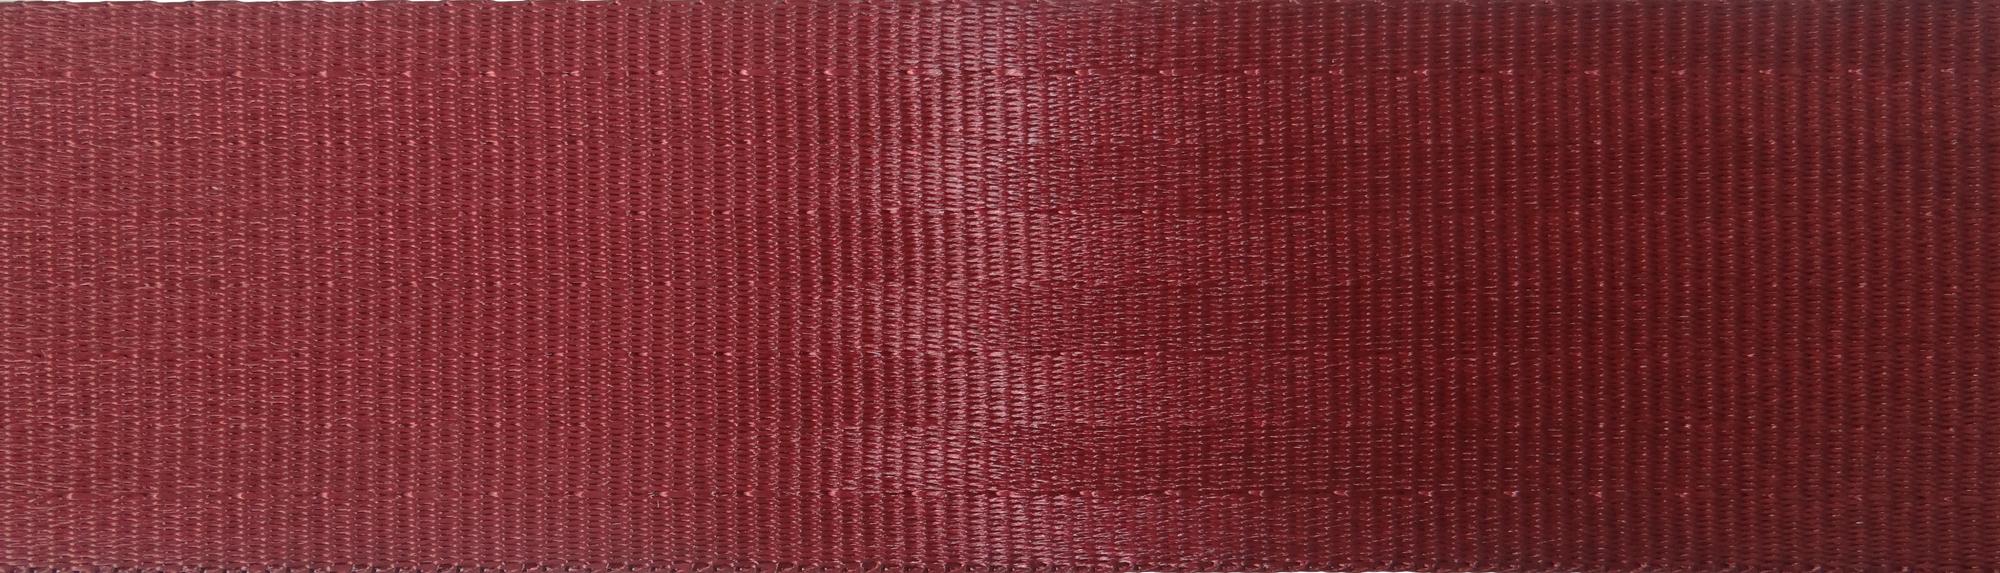 8 Panel Burgundy